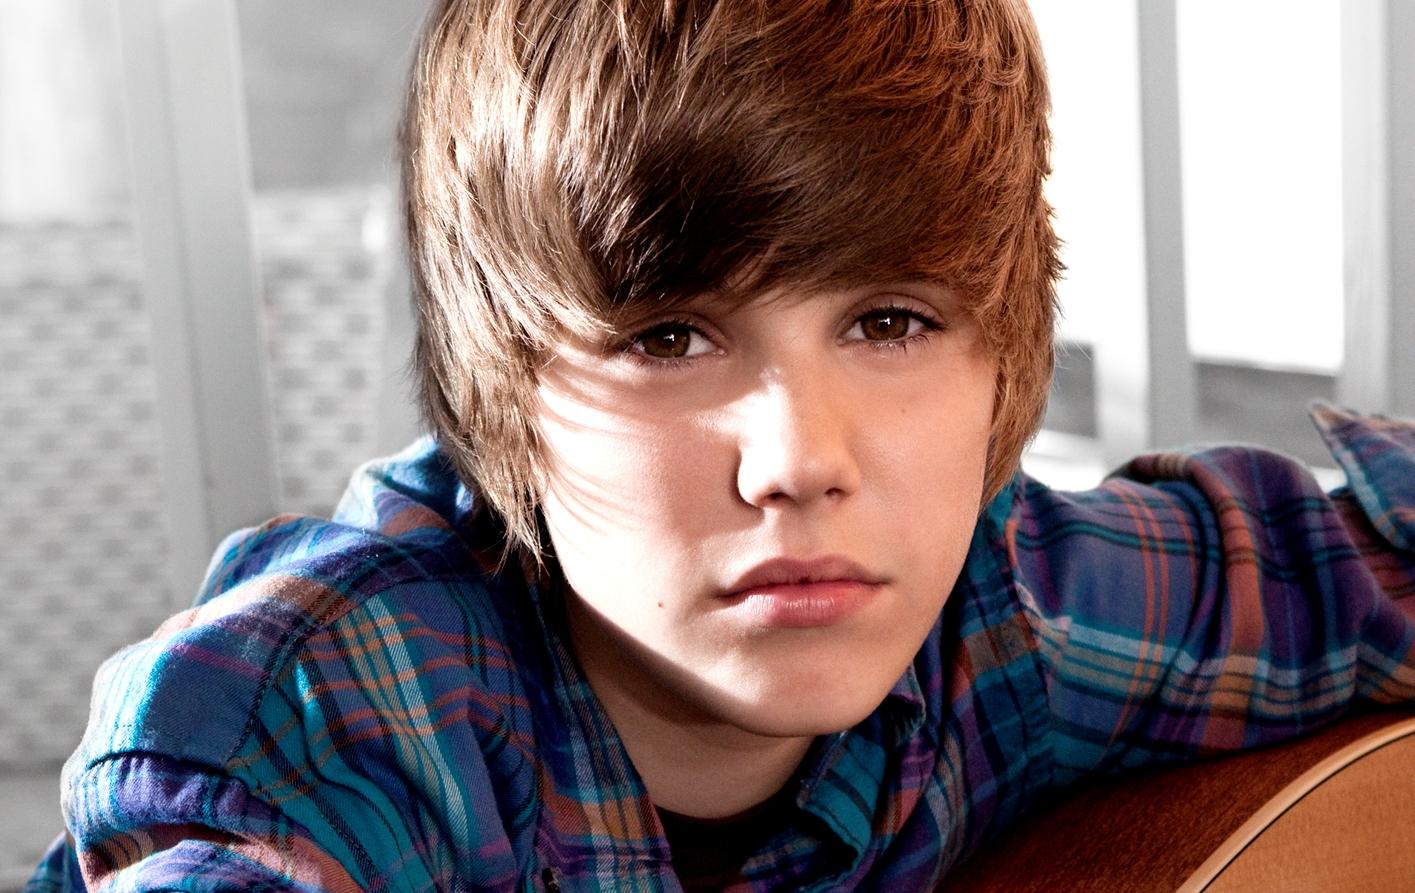 http://4.bp.blogspot.com/-Wqwuu1Sas74/TacVGJPzNhI/AAAAAAAAApU/EaDzLlUn68o/s1600/Justin+Bieber+2011+Cool+Hot+Wallpaper+3.jpg